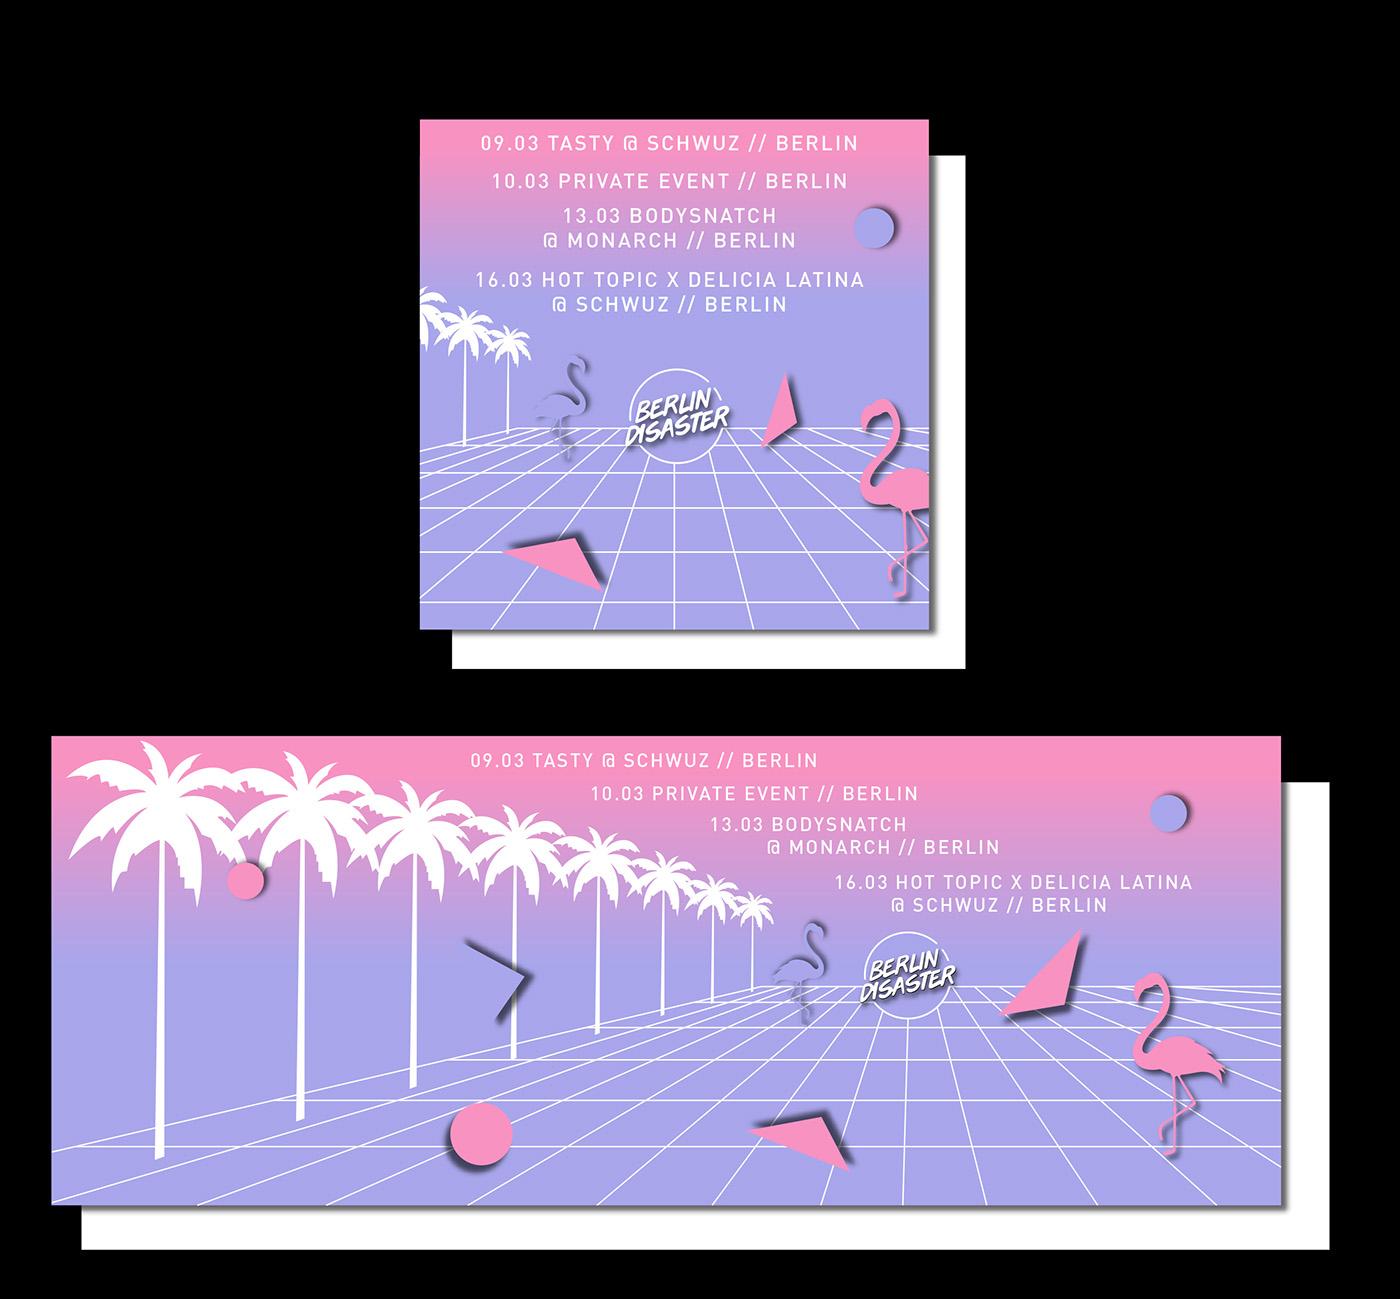 identity branding  digital graphic design  graphic ILLUSTRATION  neon vaporwave Memphis music